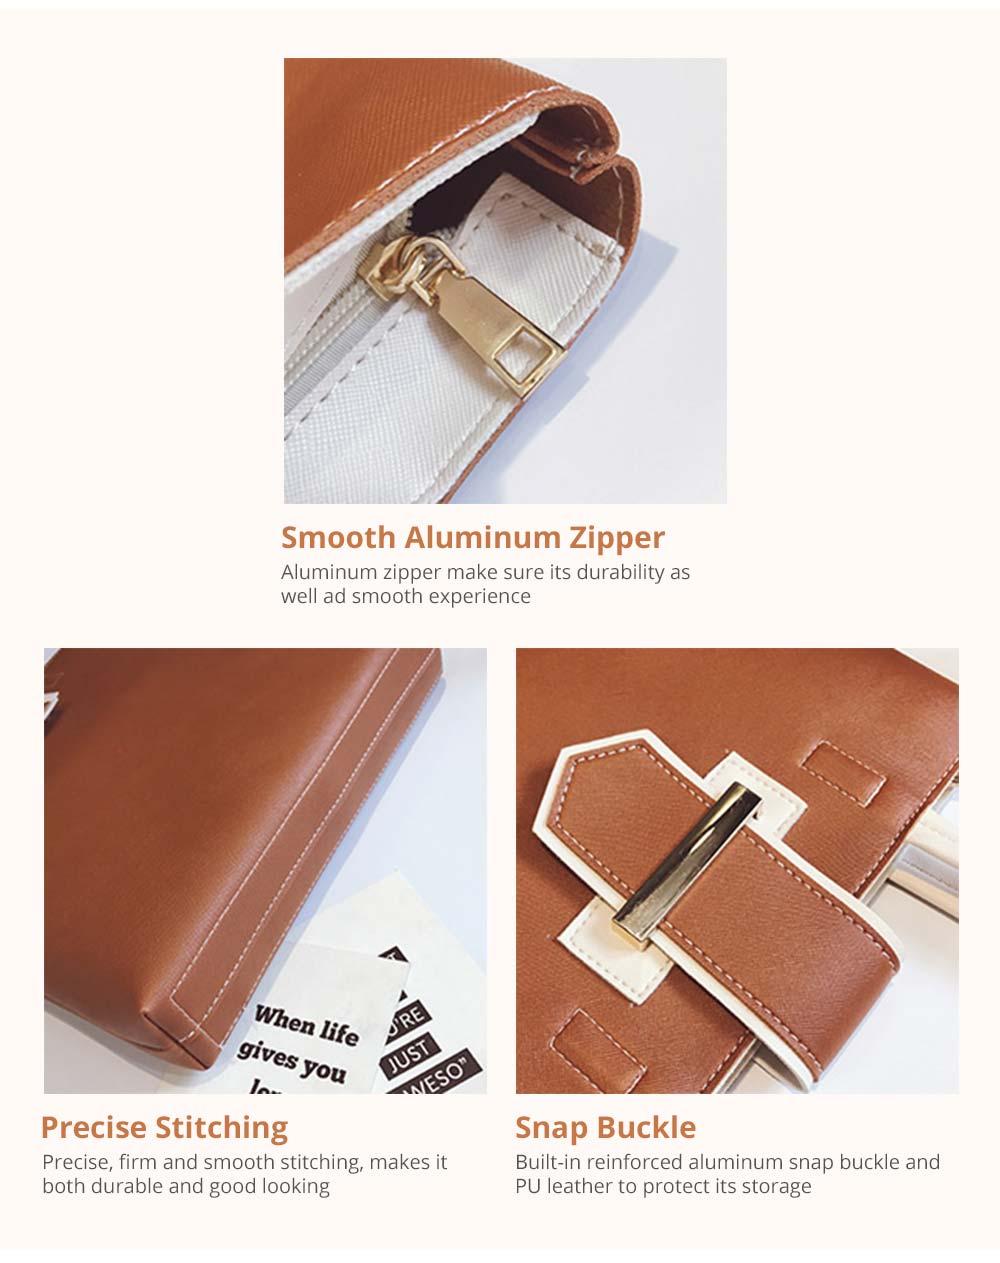 Women's Shoulder Bag with Smooth Aluminum Zipper